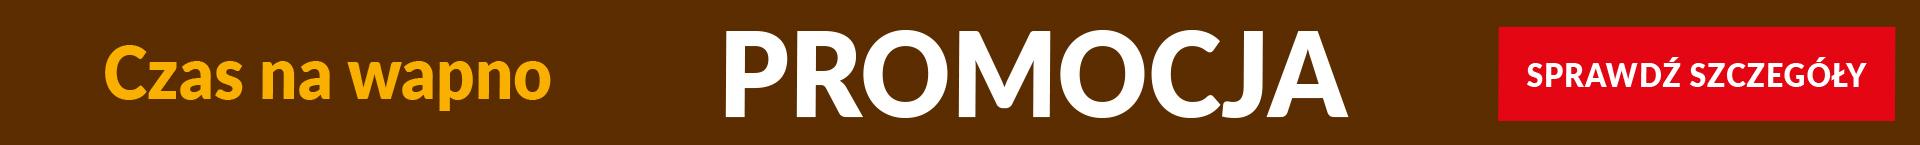 banner promocja